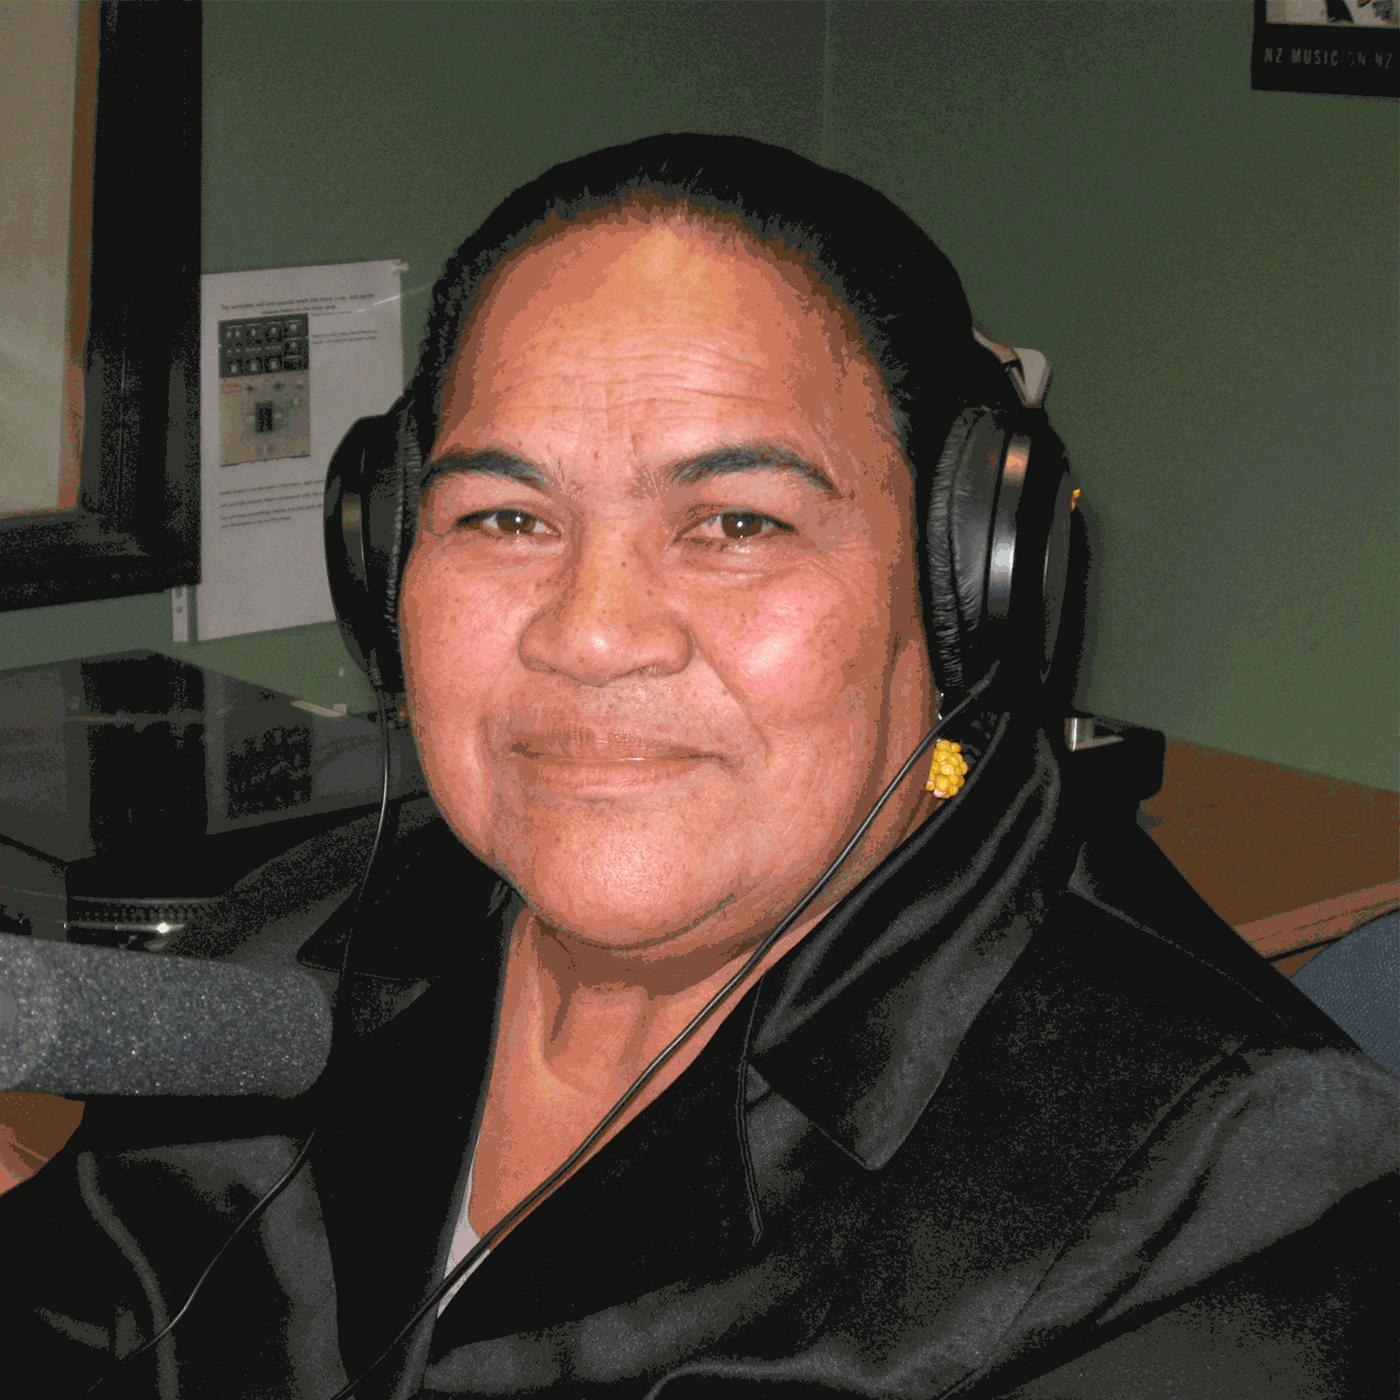 https://cdn.accessradio.org/StationFolder/war/Images/Punaaga_Vagahau_Niue.png